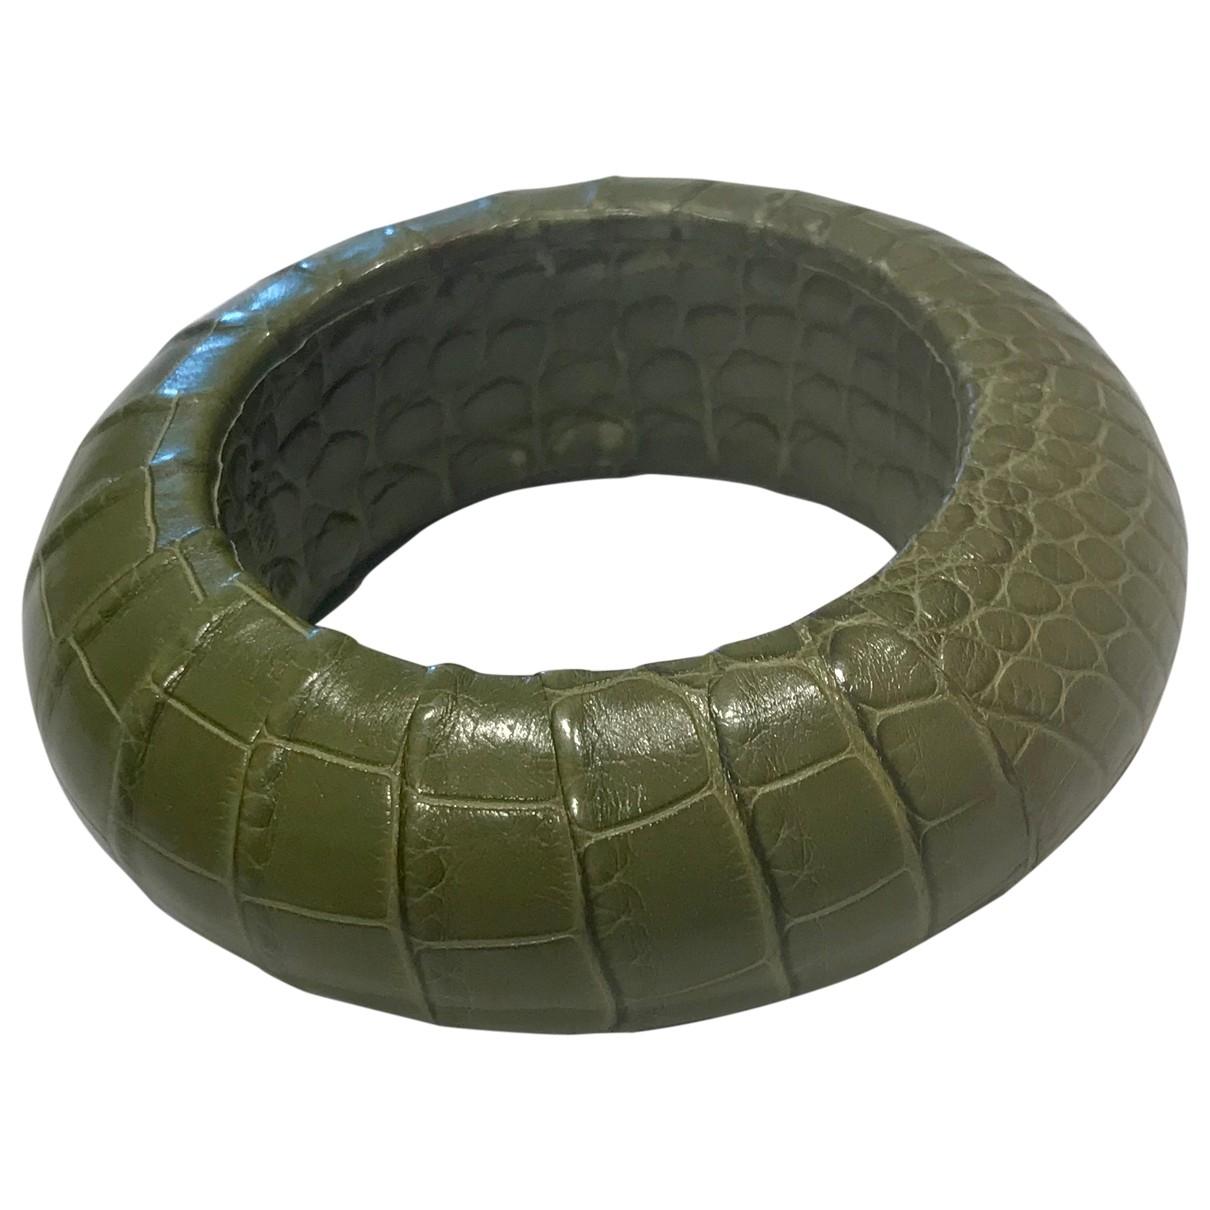 Loewe \N Armband in  Gruen Krokodil